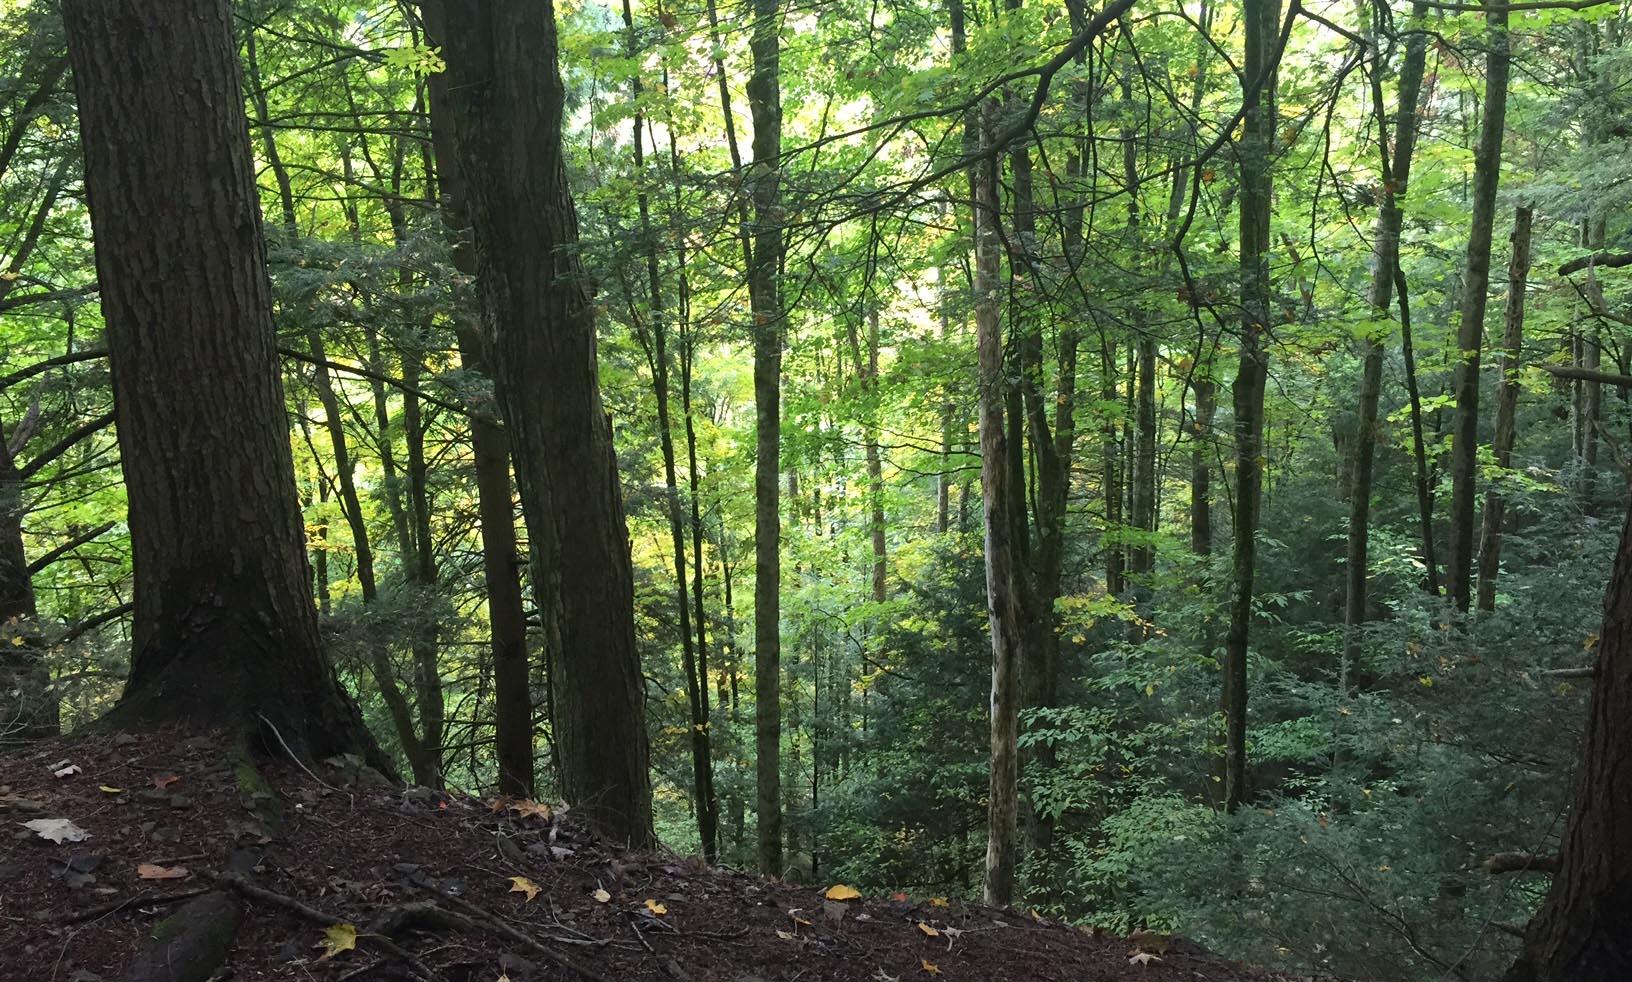 Shindagin Hollow forest scene